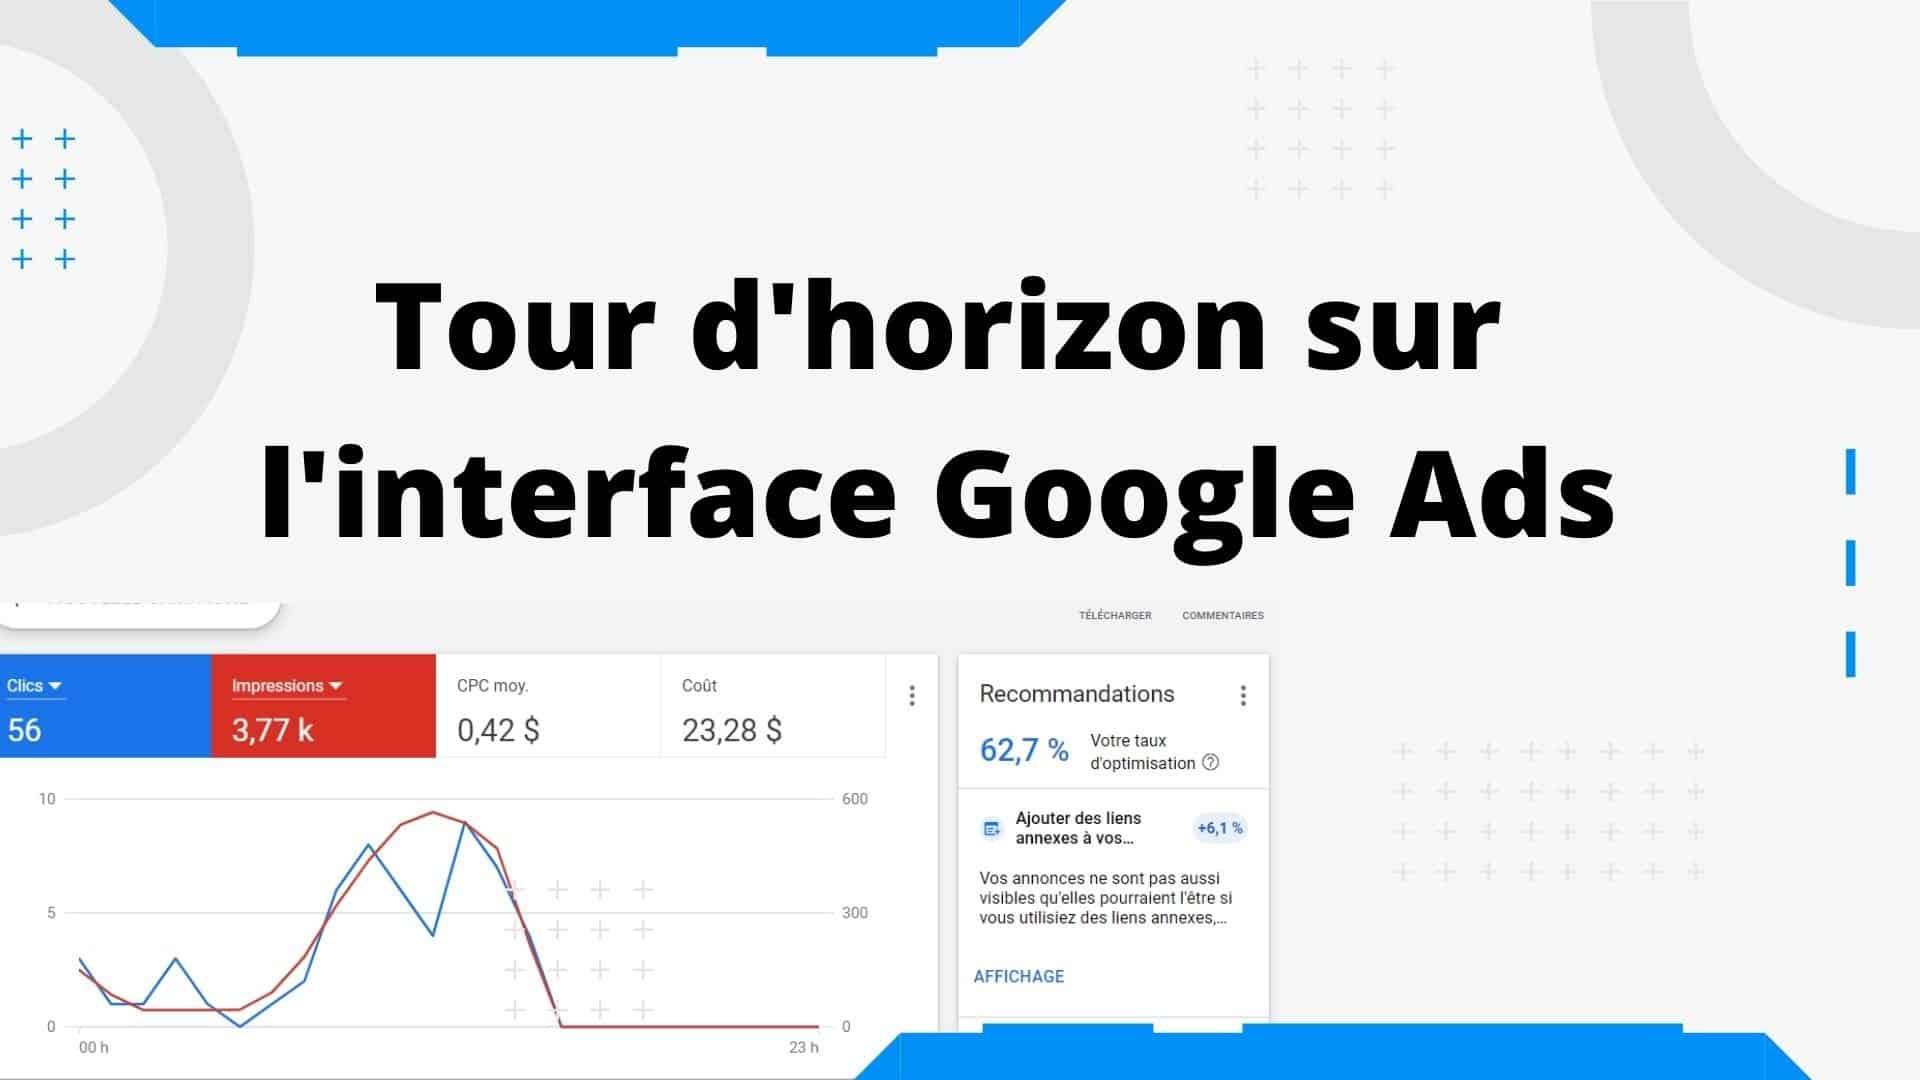 Interface Google